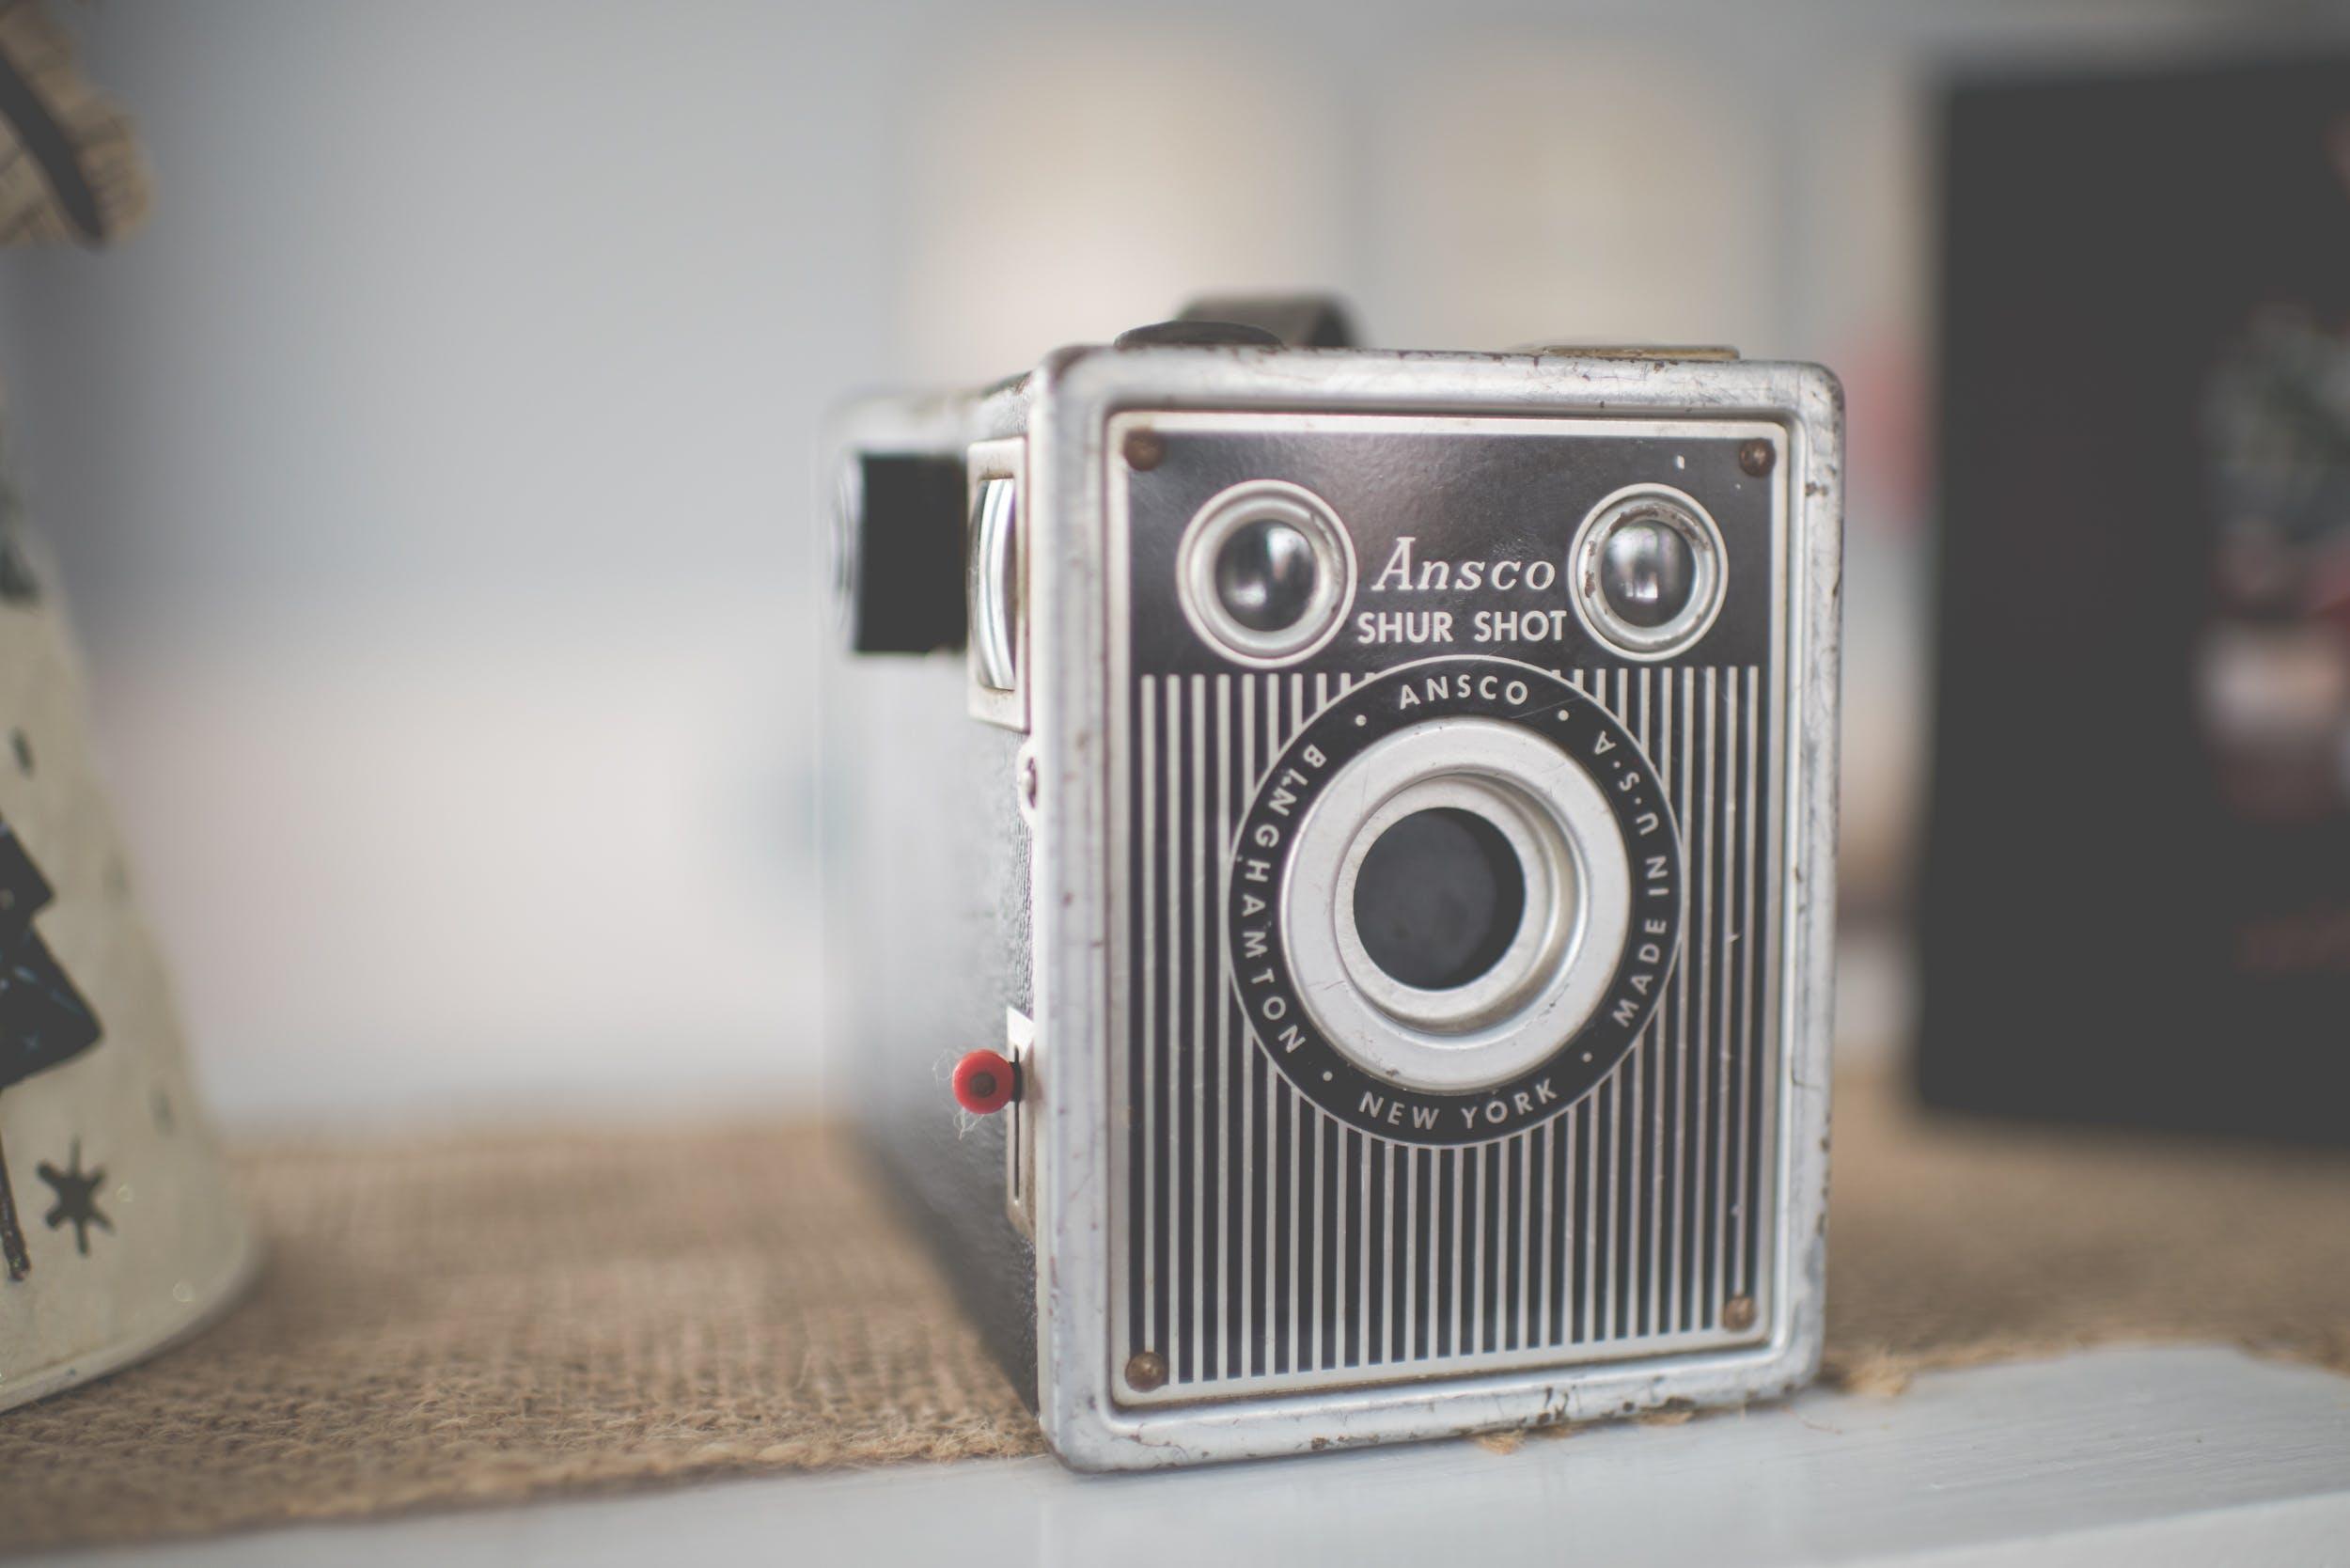 Black and Gray Ansco Shur Shot Camera